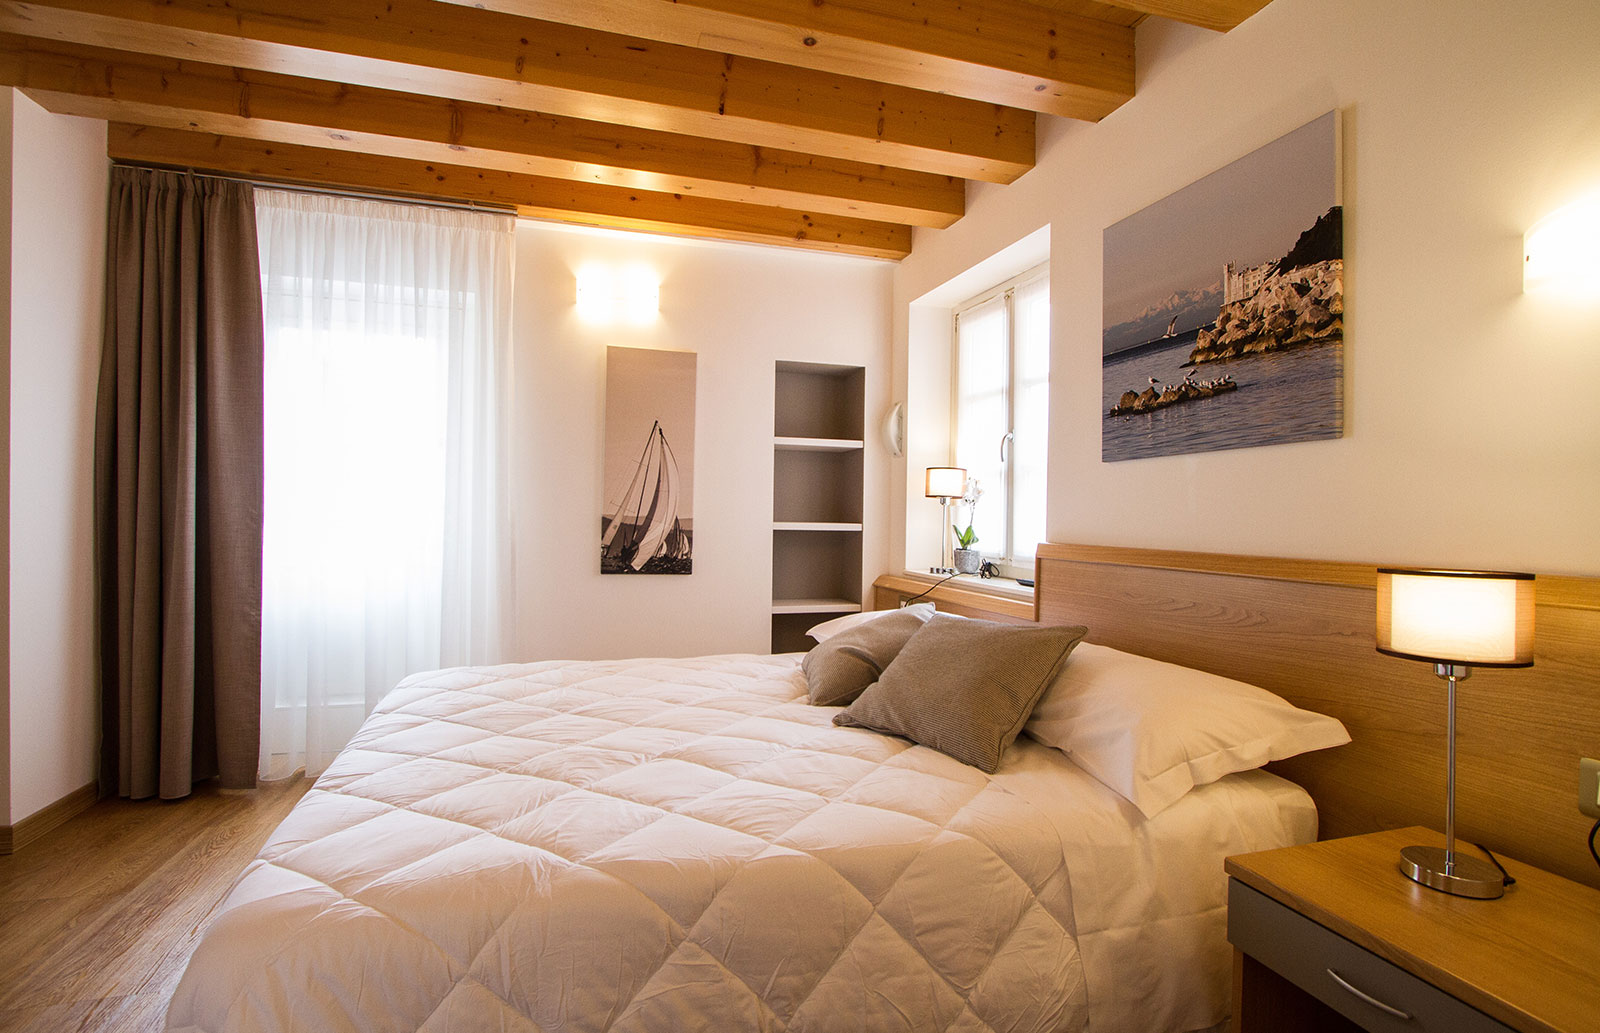 Letto Matrimoniale A Trieste.Hotel All Arco Trieste Dormire A Trieste